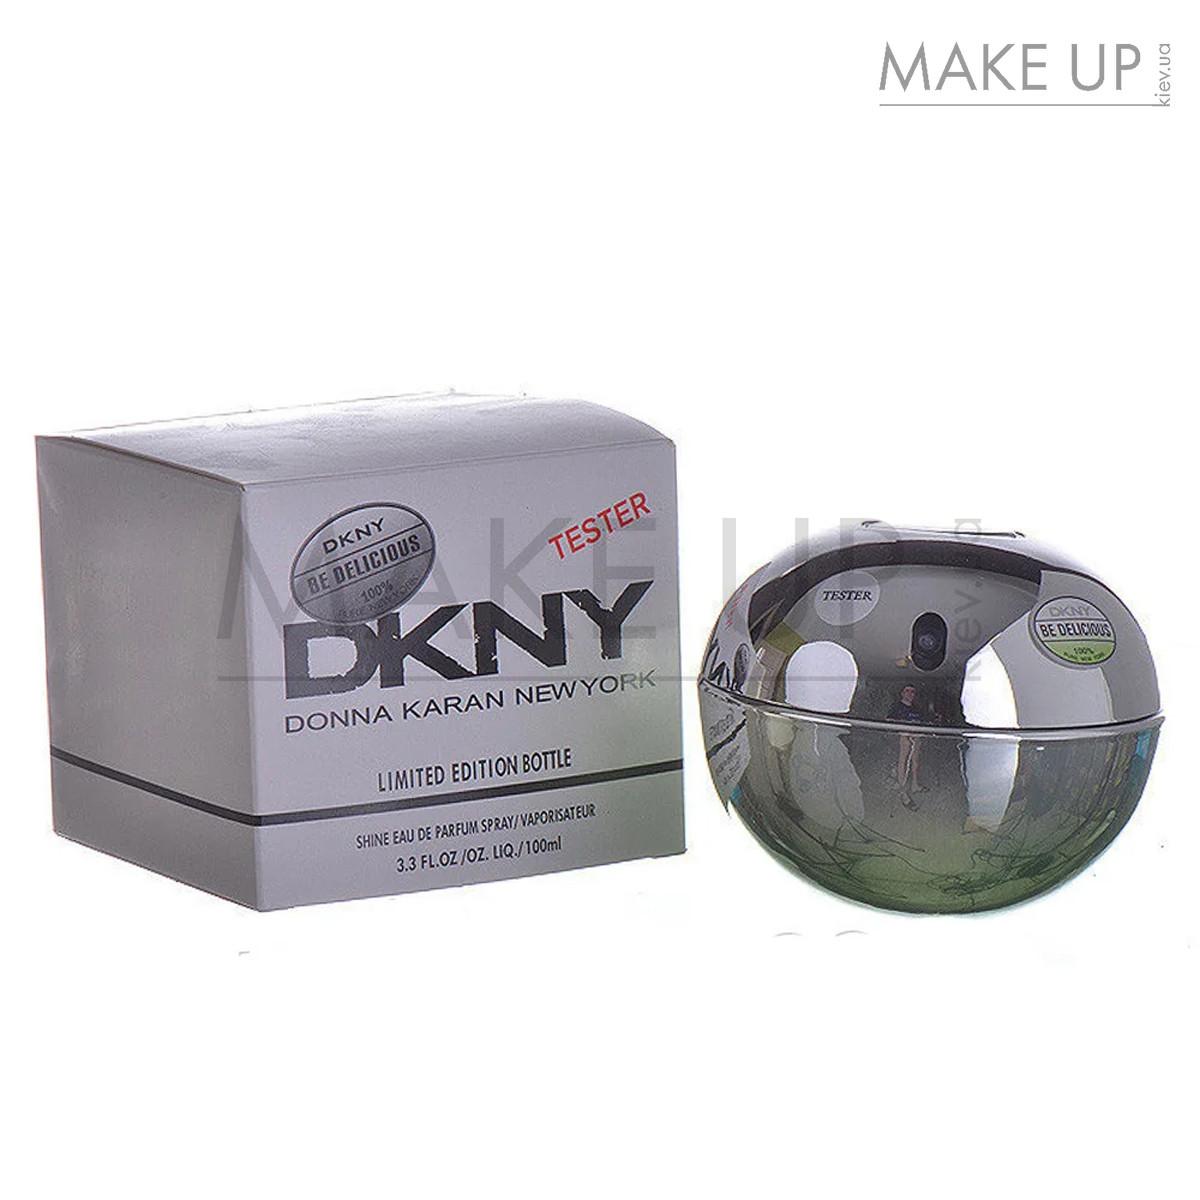 Tester женская парфюмированная вода DKNY Limited Edition Bottle edp 100 мл. | Лиц. ОАЭ Тестер